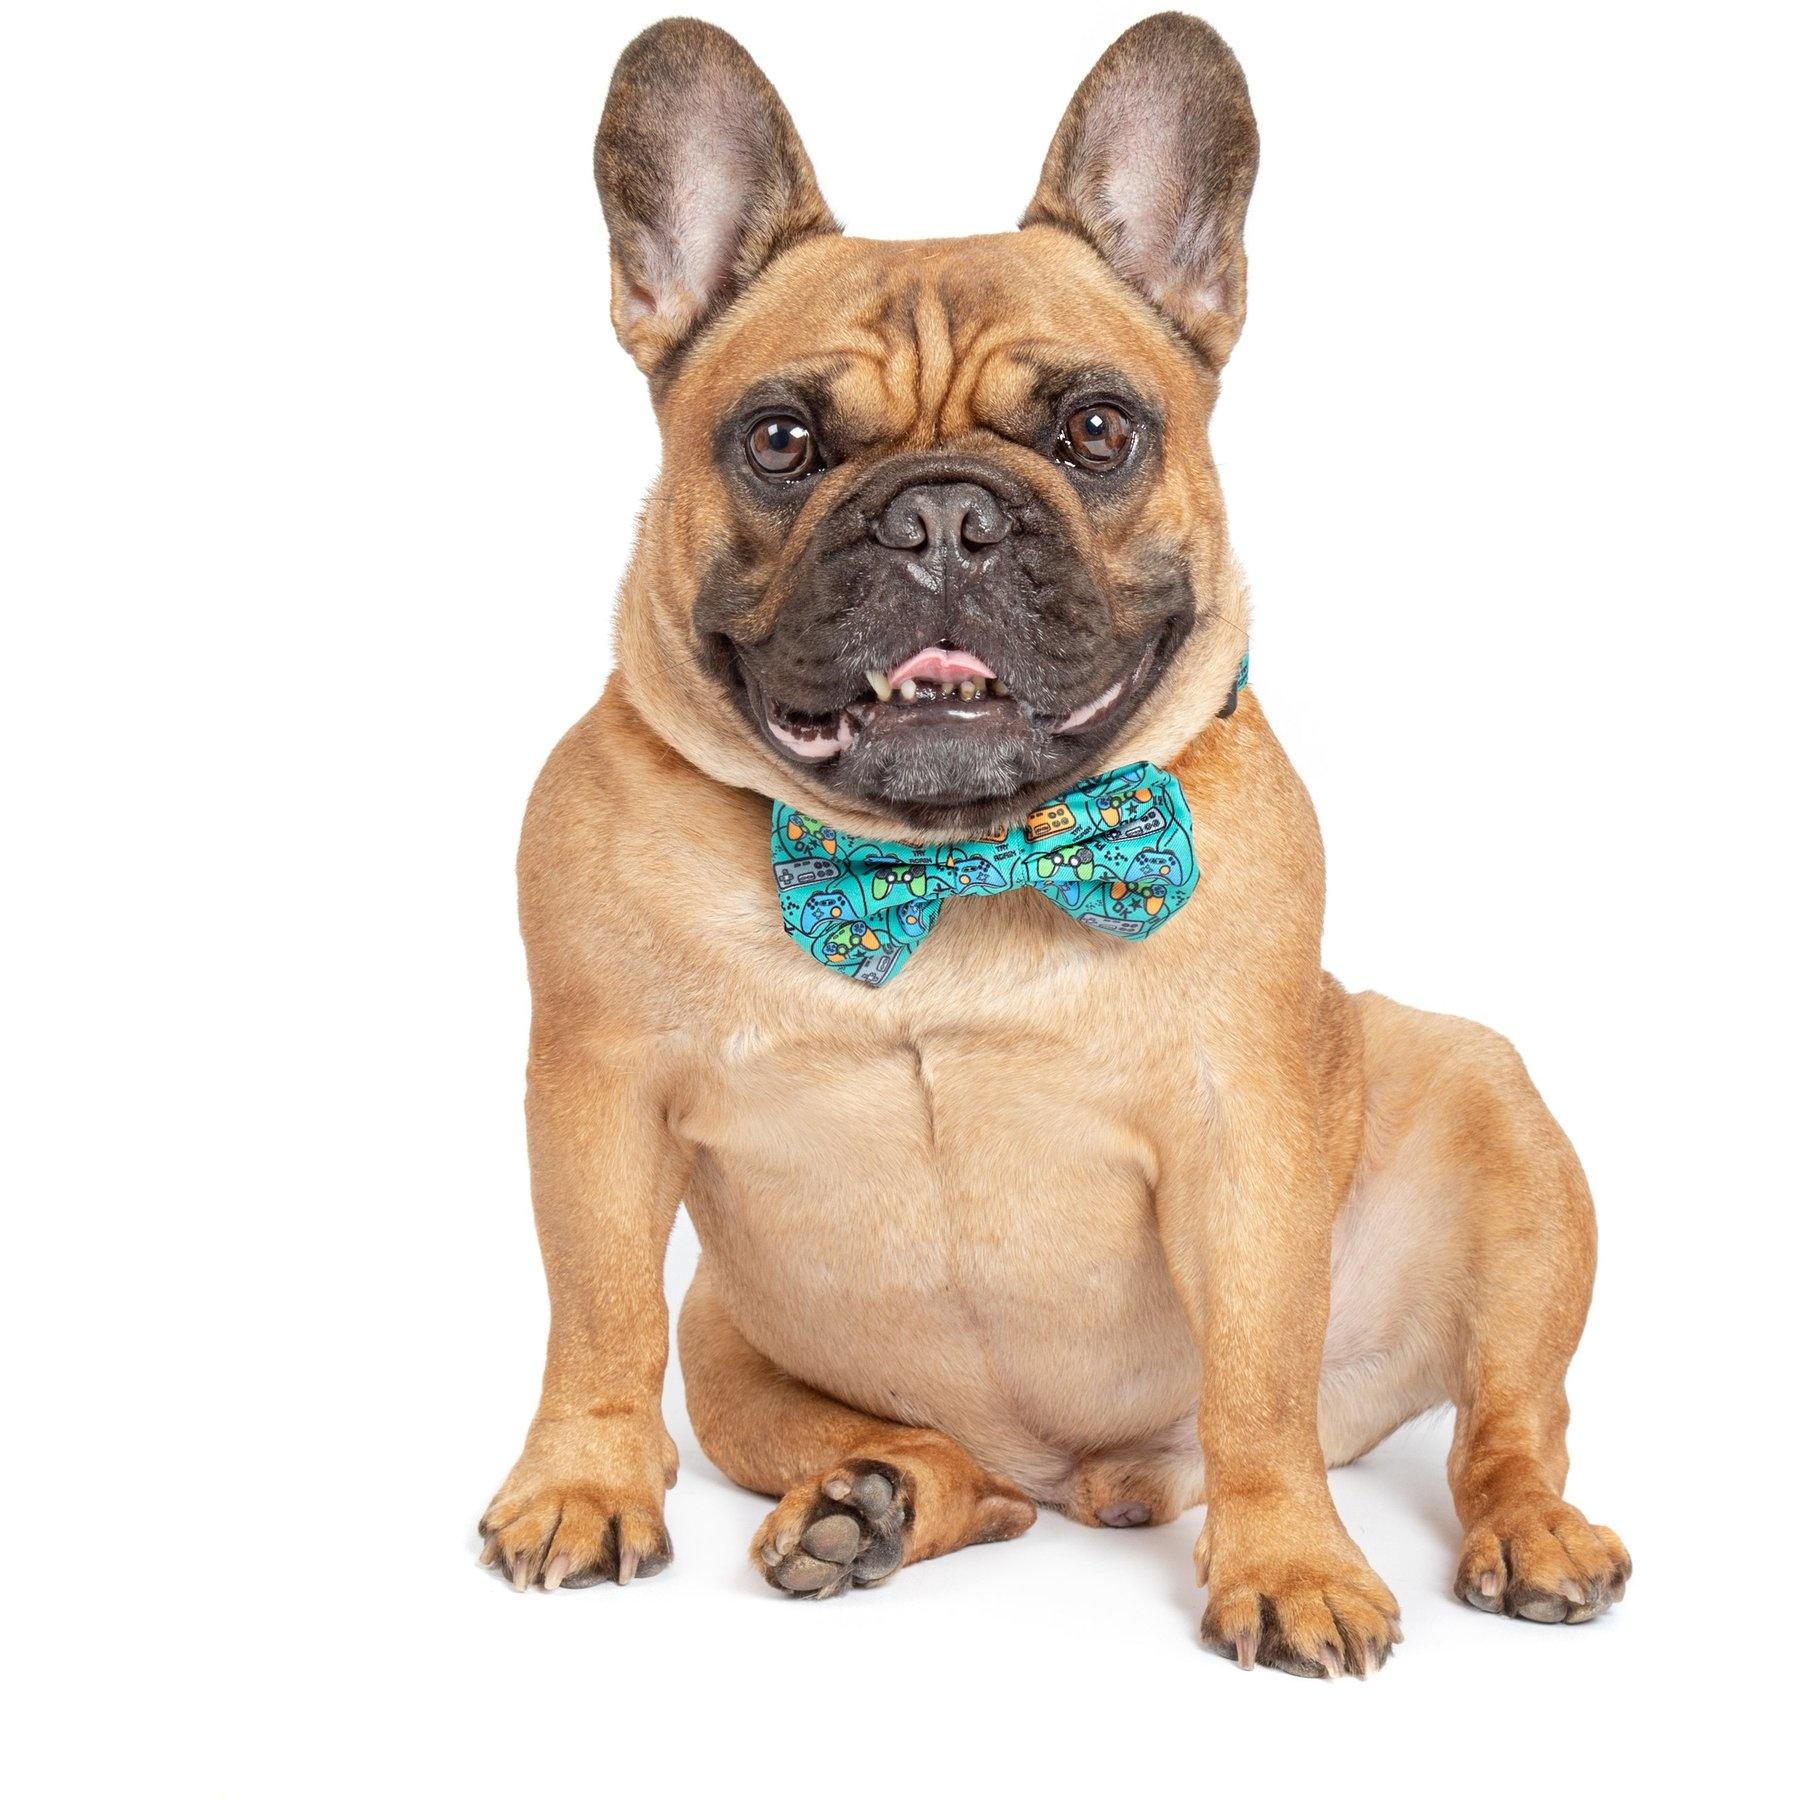 Big and Little Dogs Big and Little Dogs Dog Collar & Bow Tie